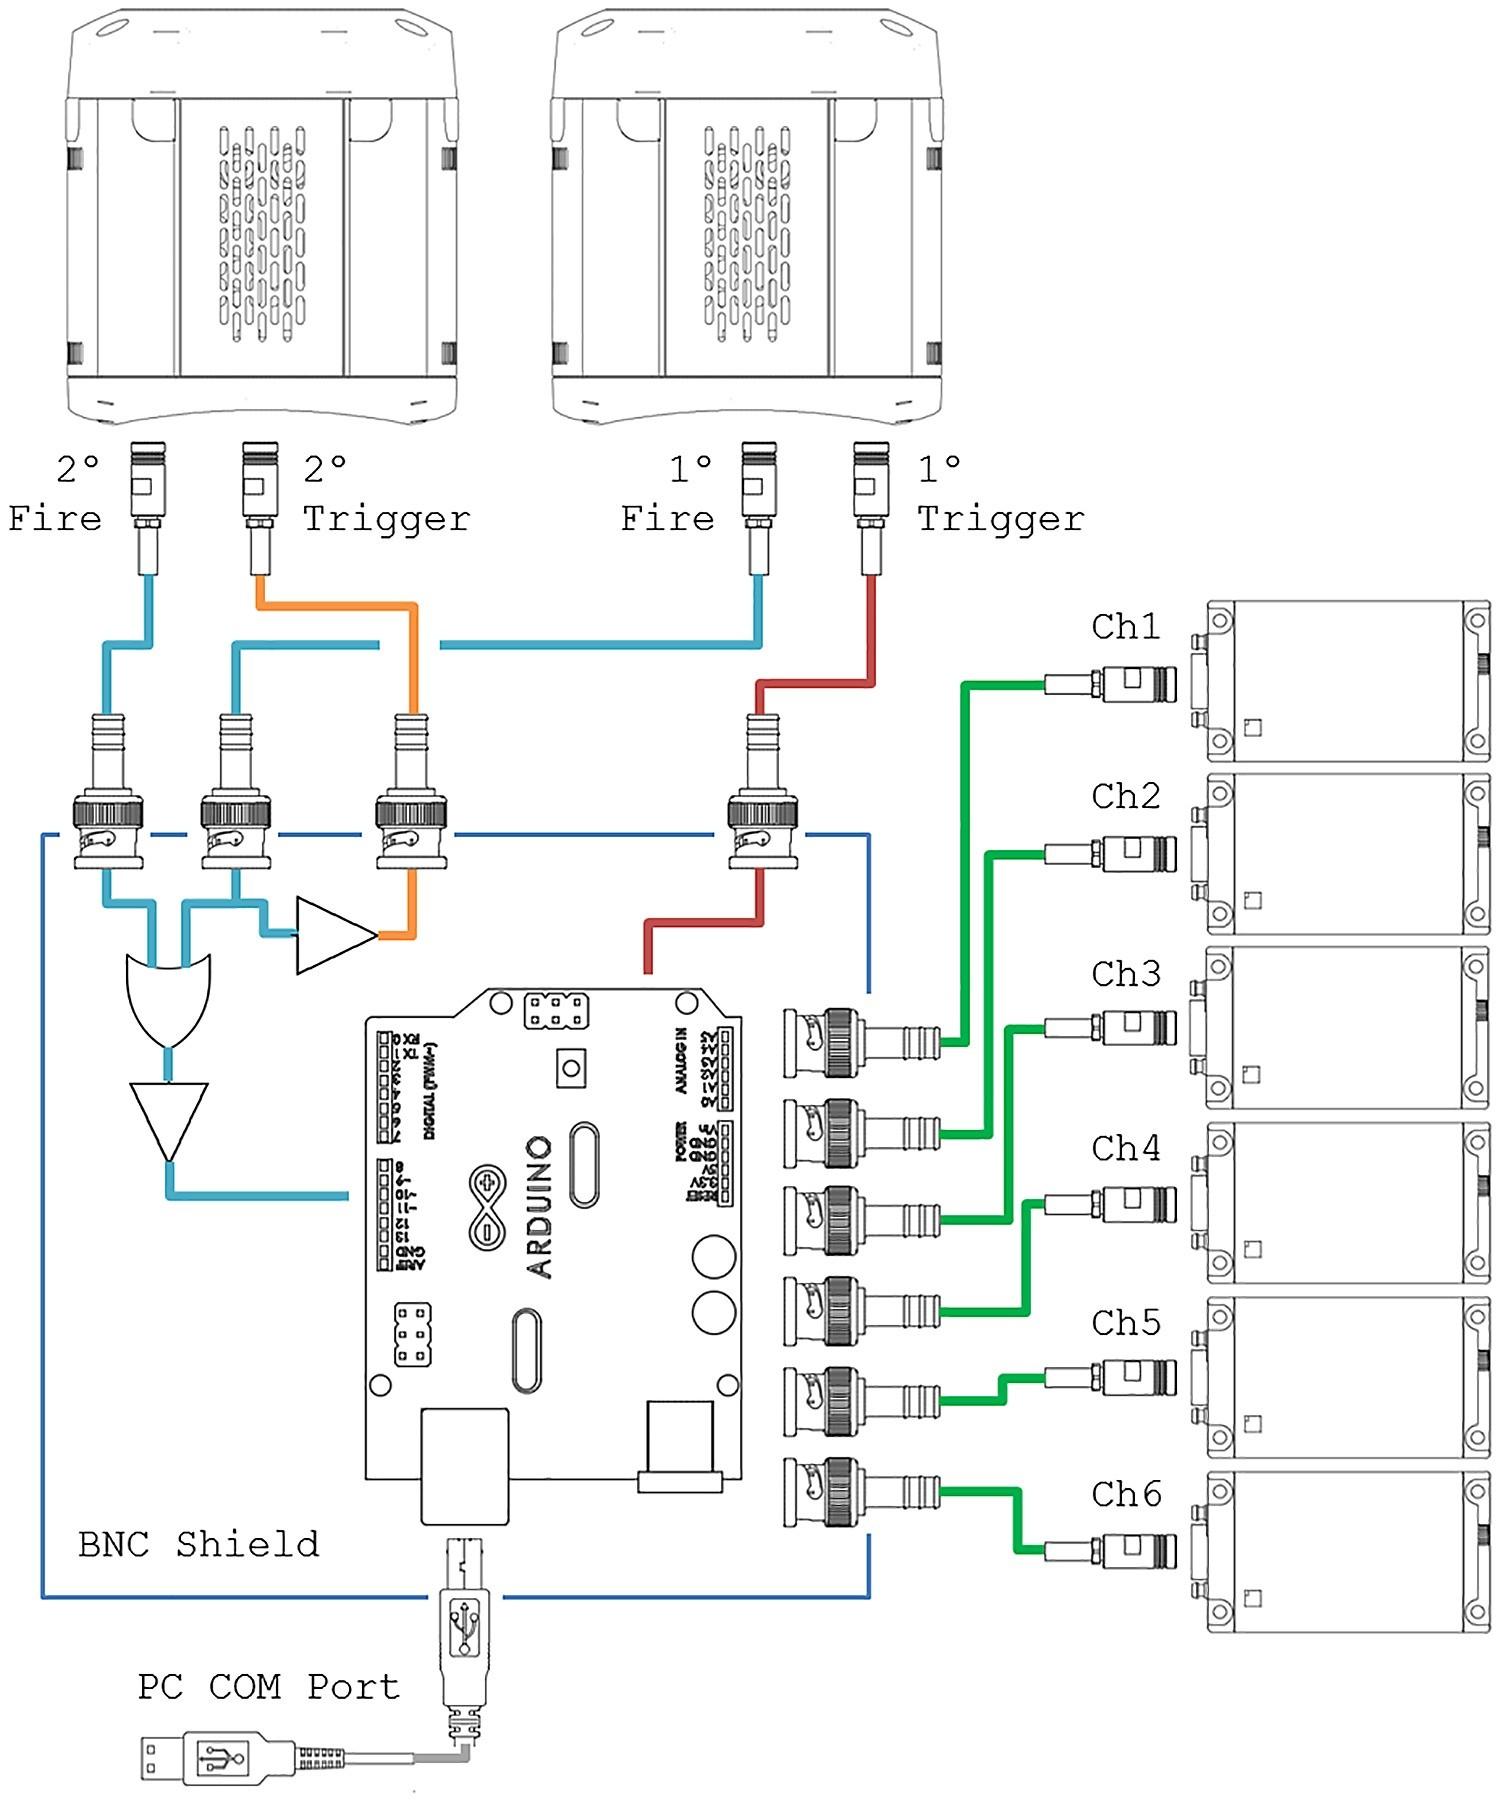 Circuit Diagram Maker Arduino Circuit Diagram Of the Nicolase Arduino Controller Of Circuit Diagram Maker Arduino